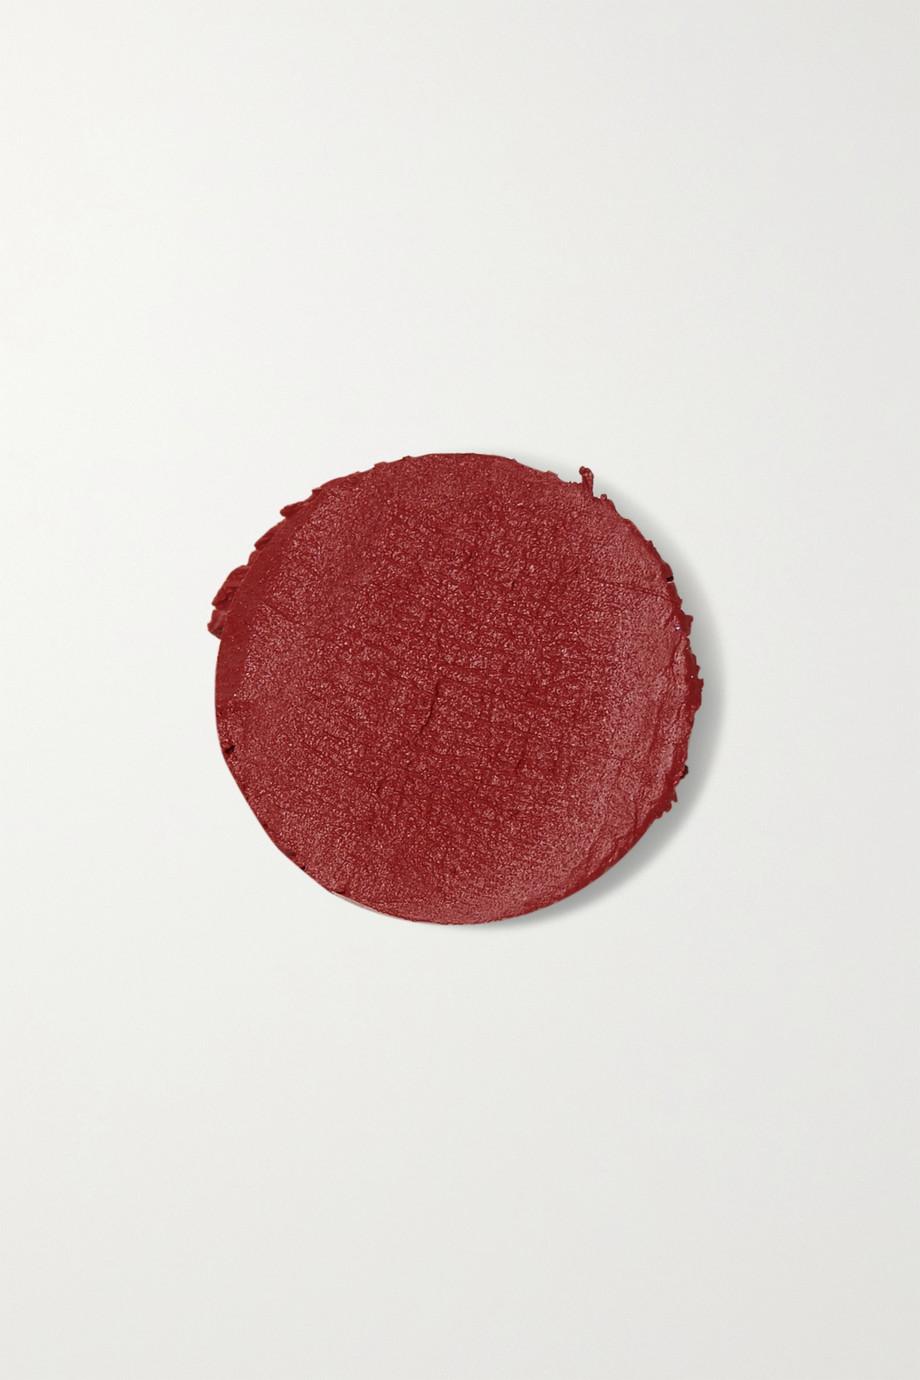 Ilia Color Block Lipstick - Cinnabar